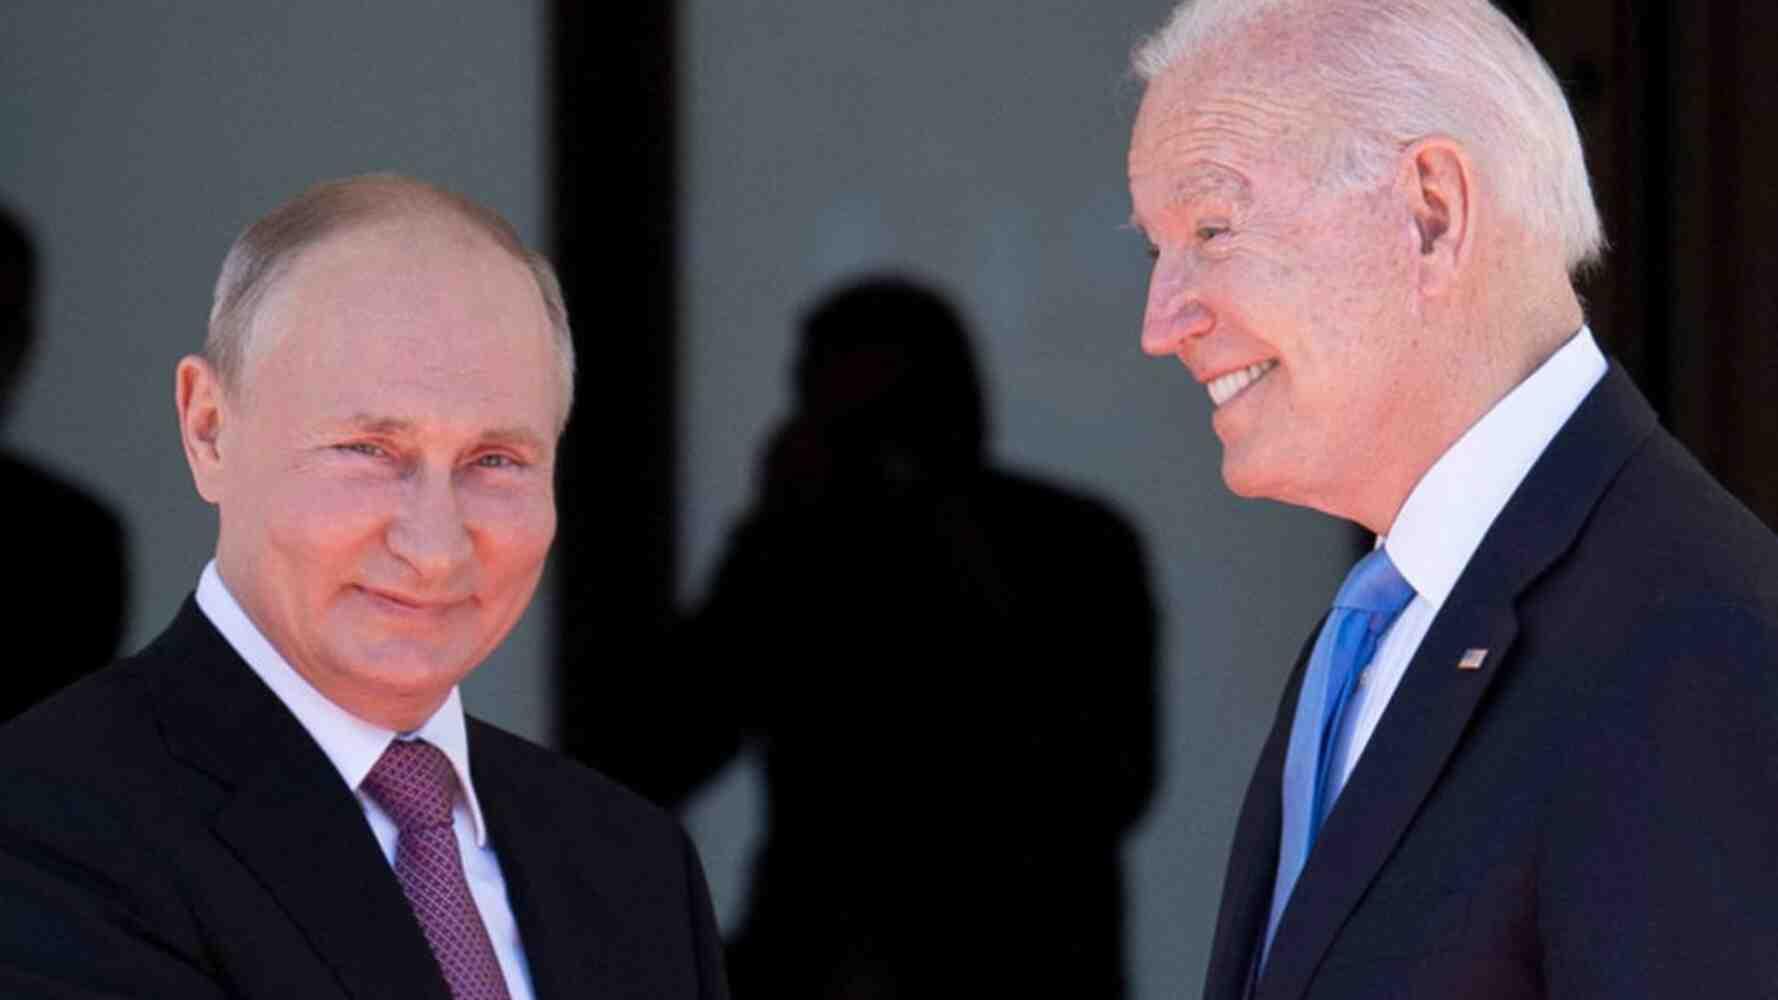 The Spectator: Байдън и Путин оставиха Великобритания зад борда